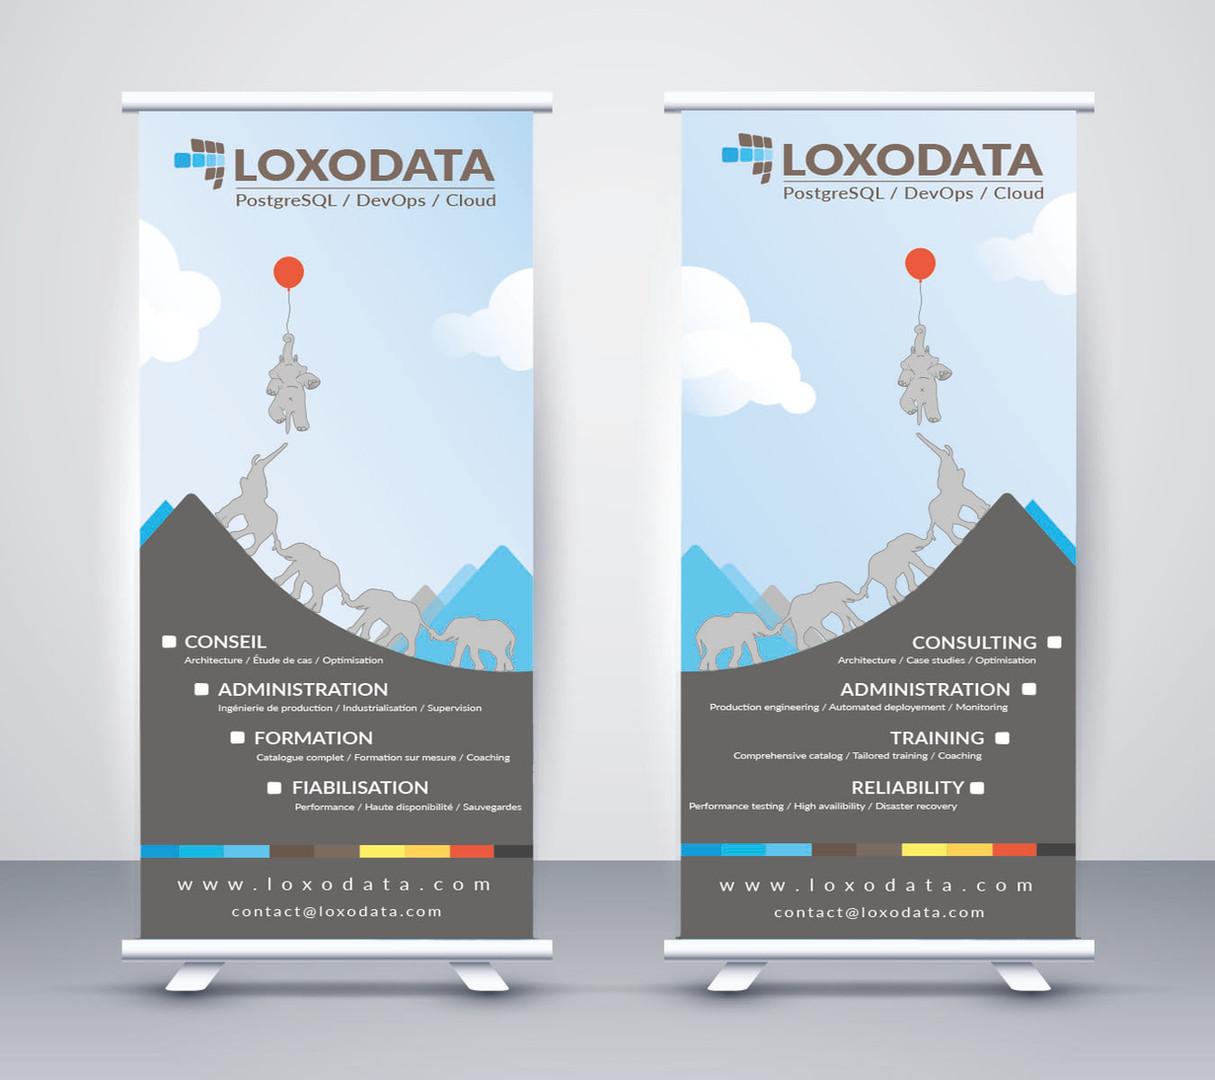 Kakemonos Loxodata.jpg